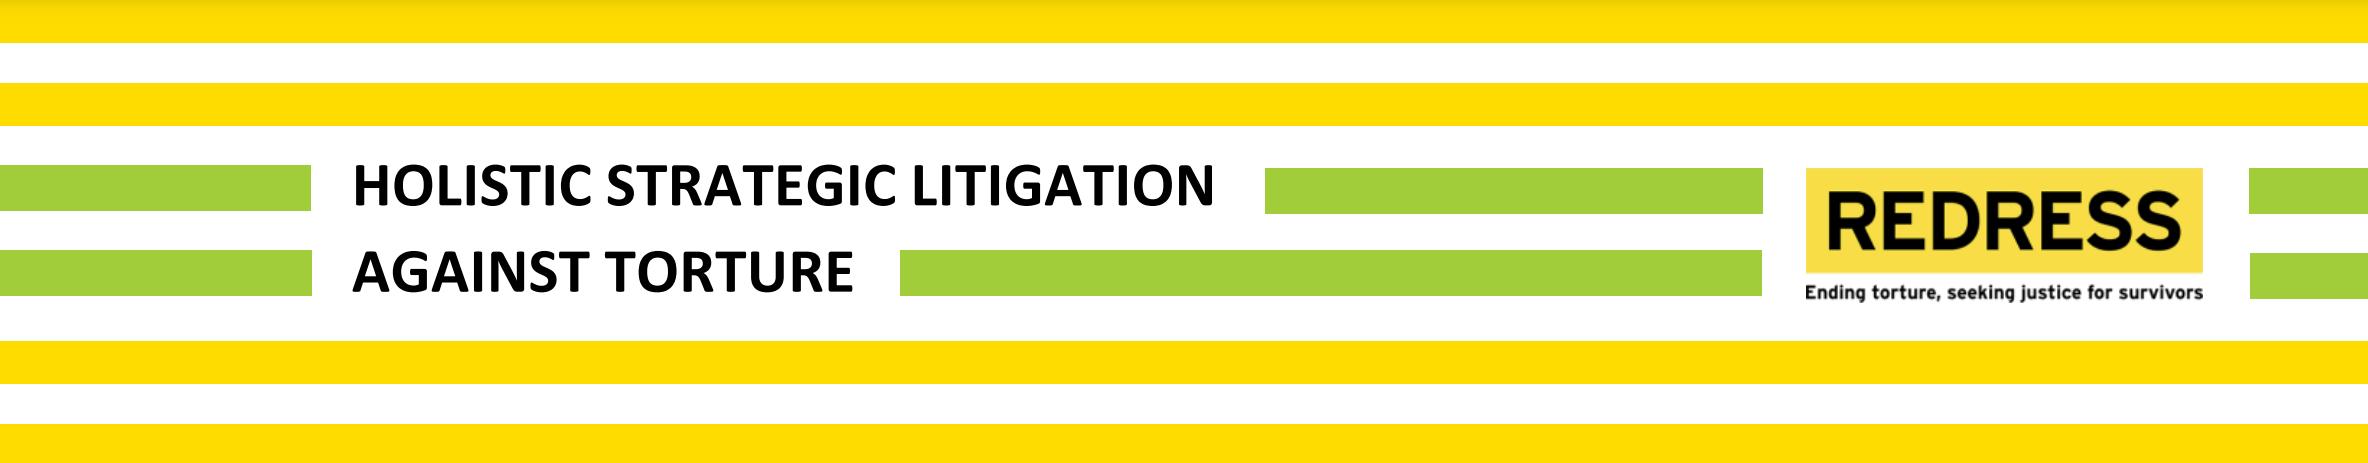 Training Modules on Strategic Litigation against Torture